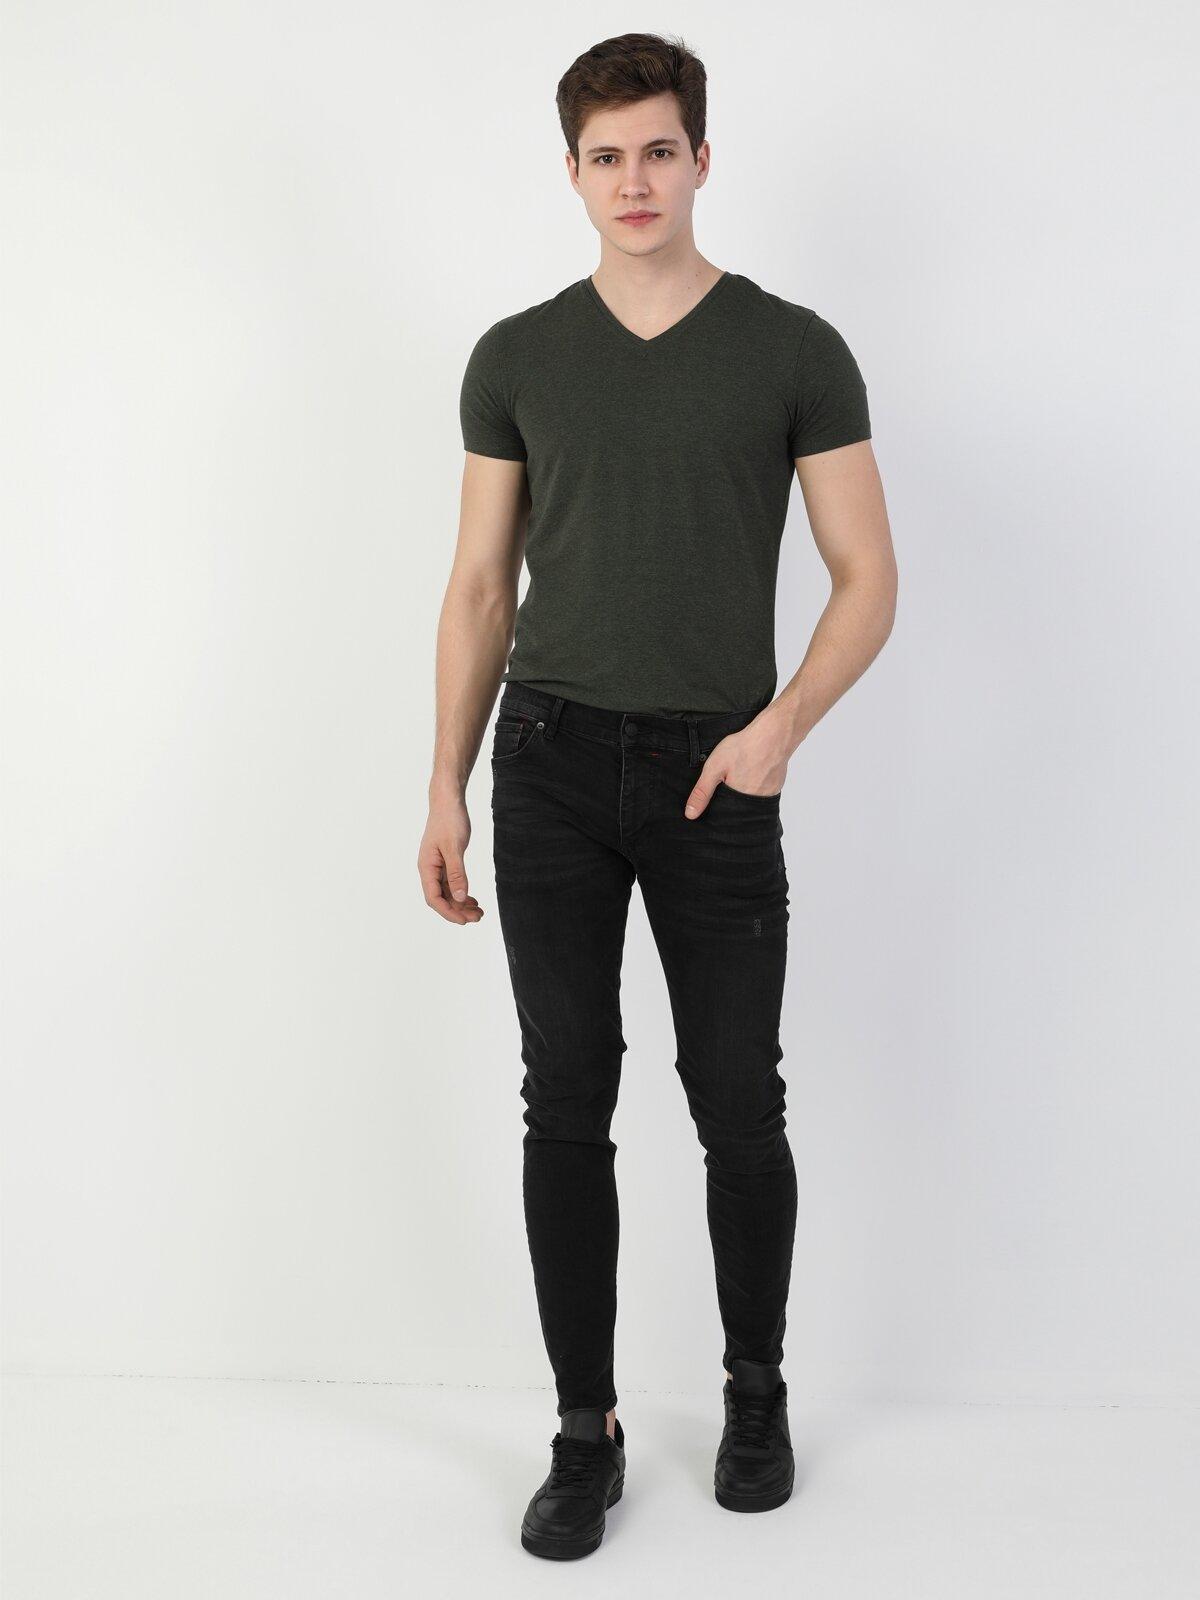 40 Alex Süper Slim Fit Düşük Bel Süper Dar Paça Erkek Siyah Jean Pantolon